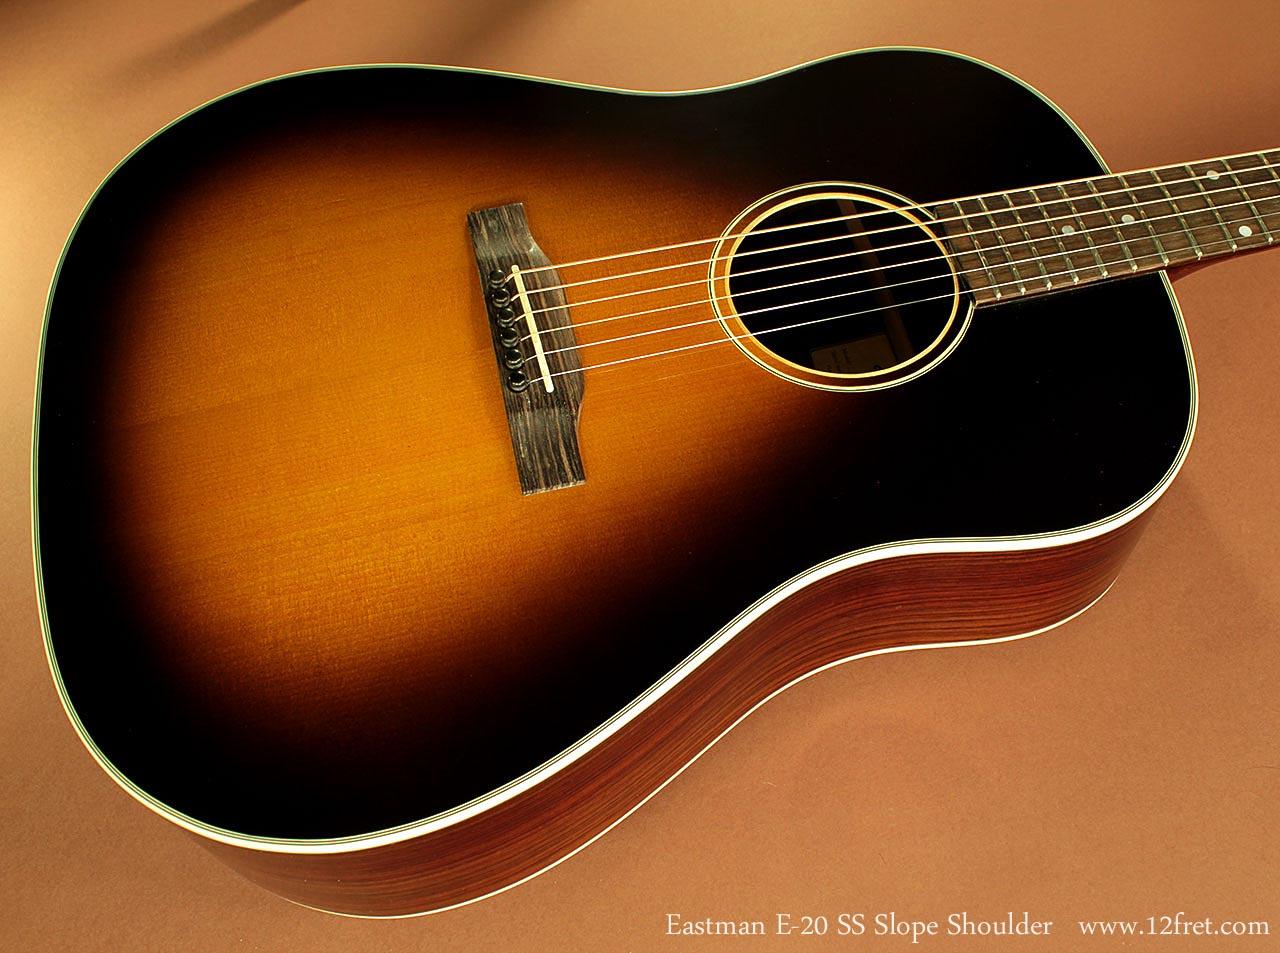 Orange Acoustic Guitars More Information Modni Auto